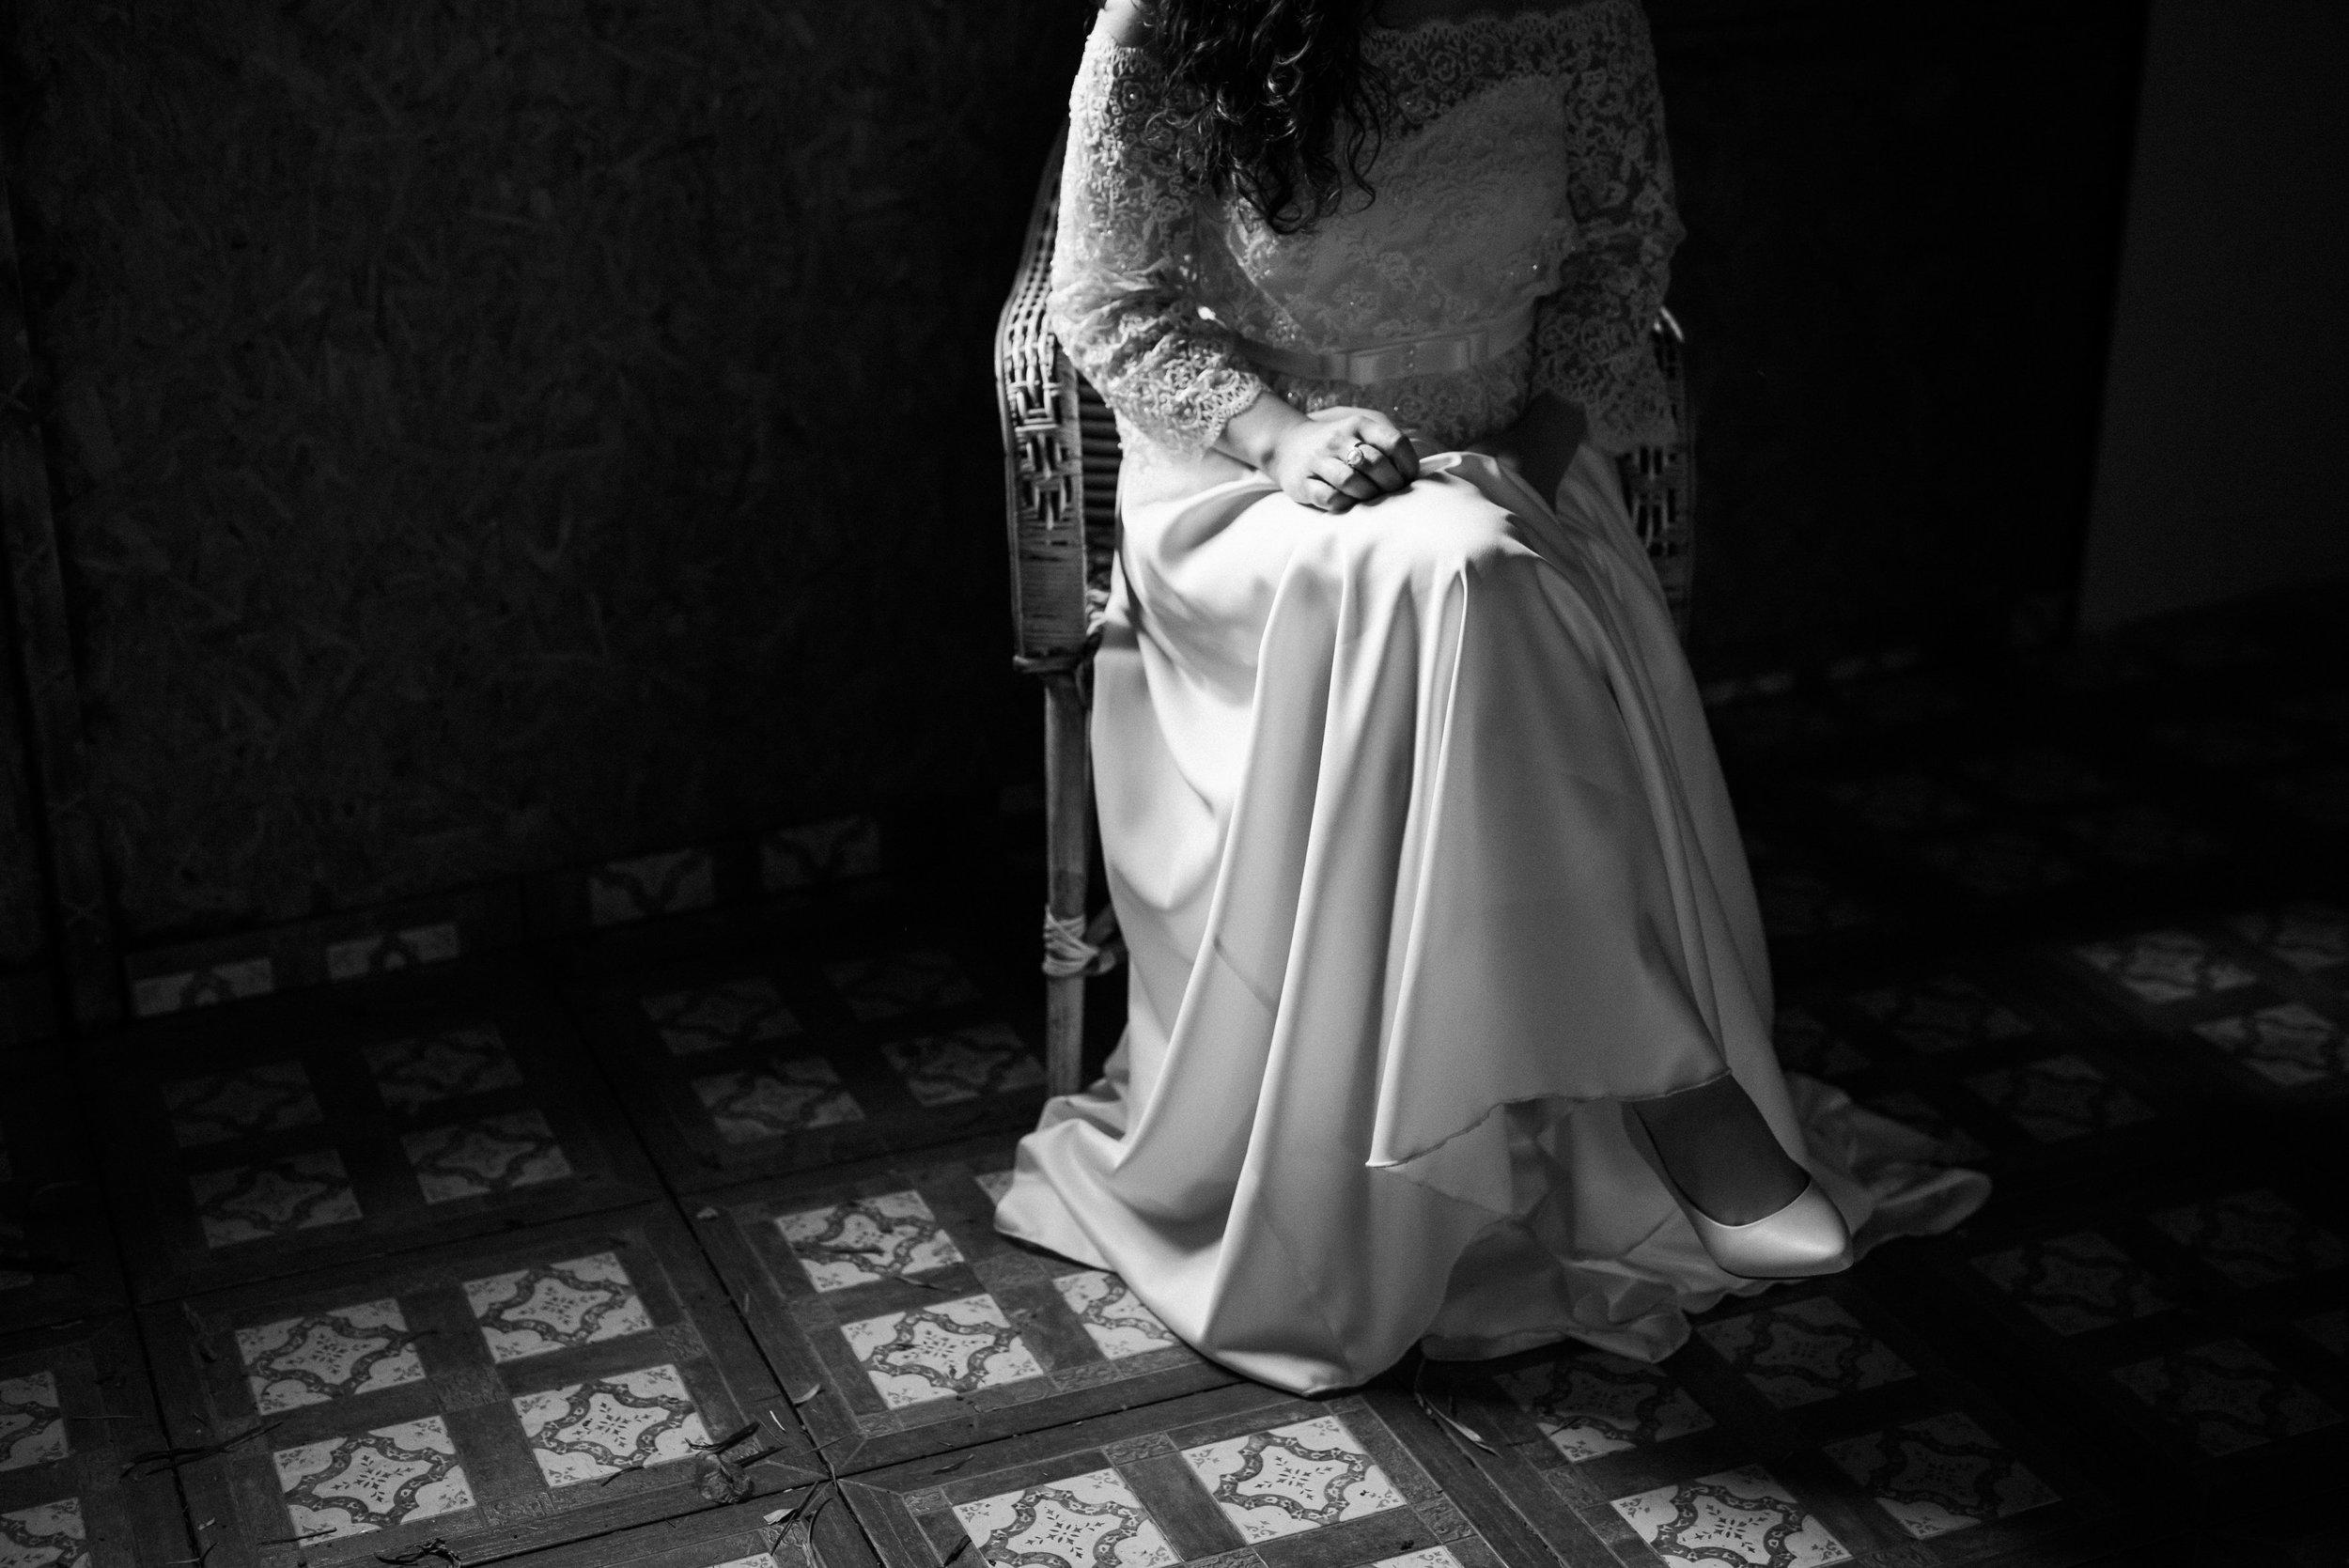 israel-garden-wedding-portraits-session-kate-giryes-photography--40_WEB.jpg